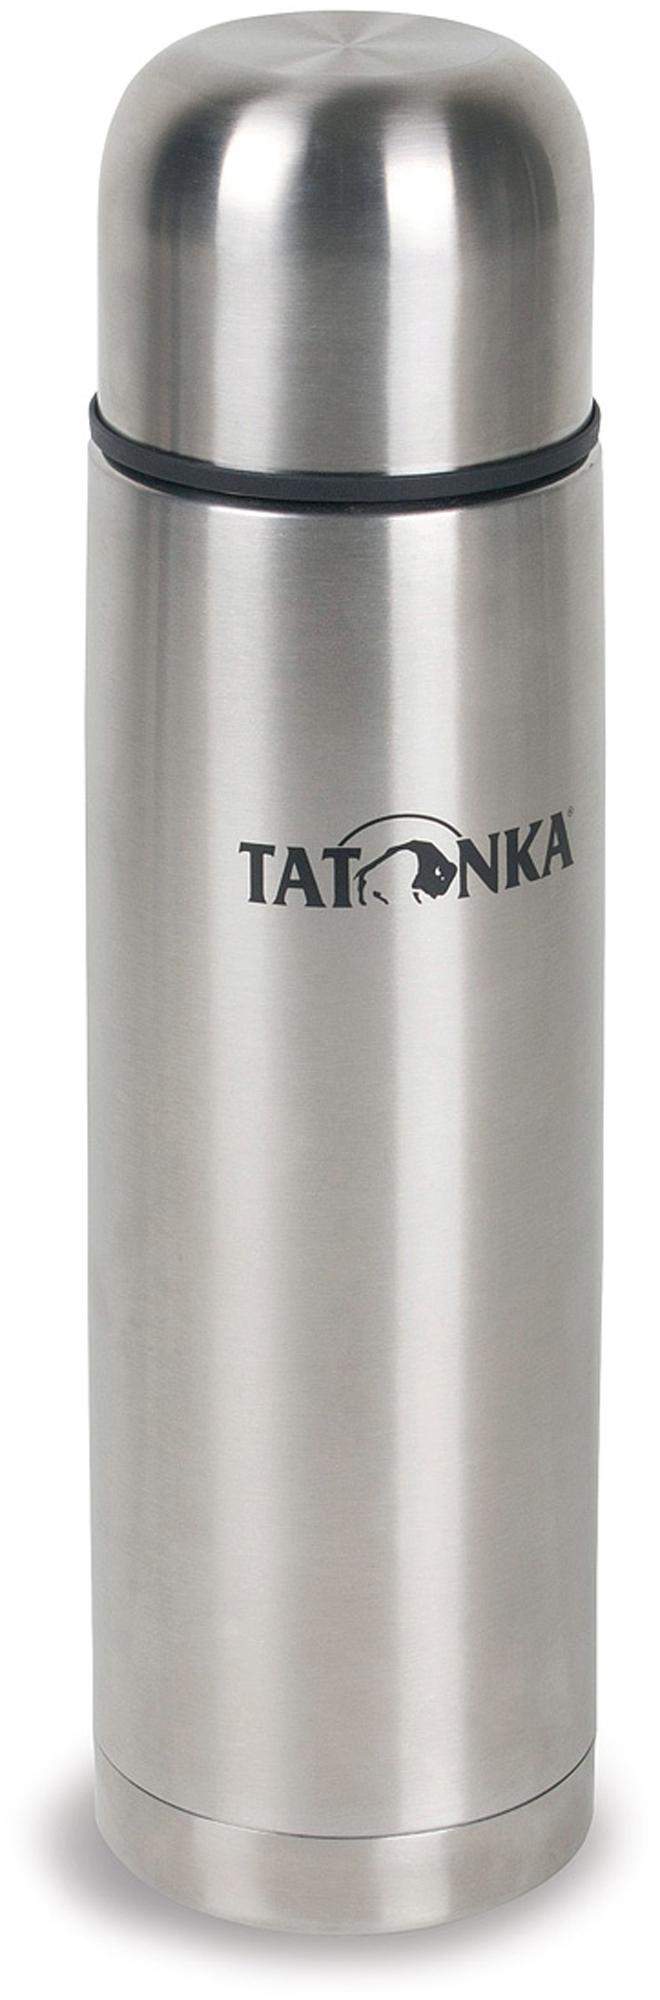 Tatonka Термос Tatonka 1 л цена 2017